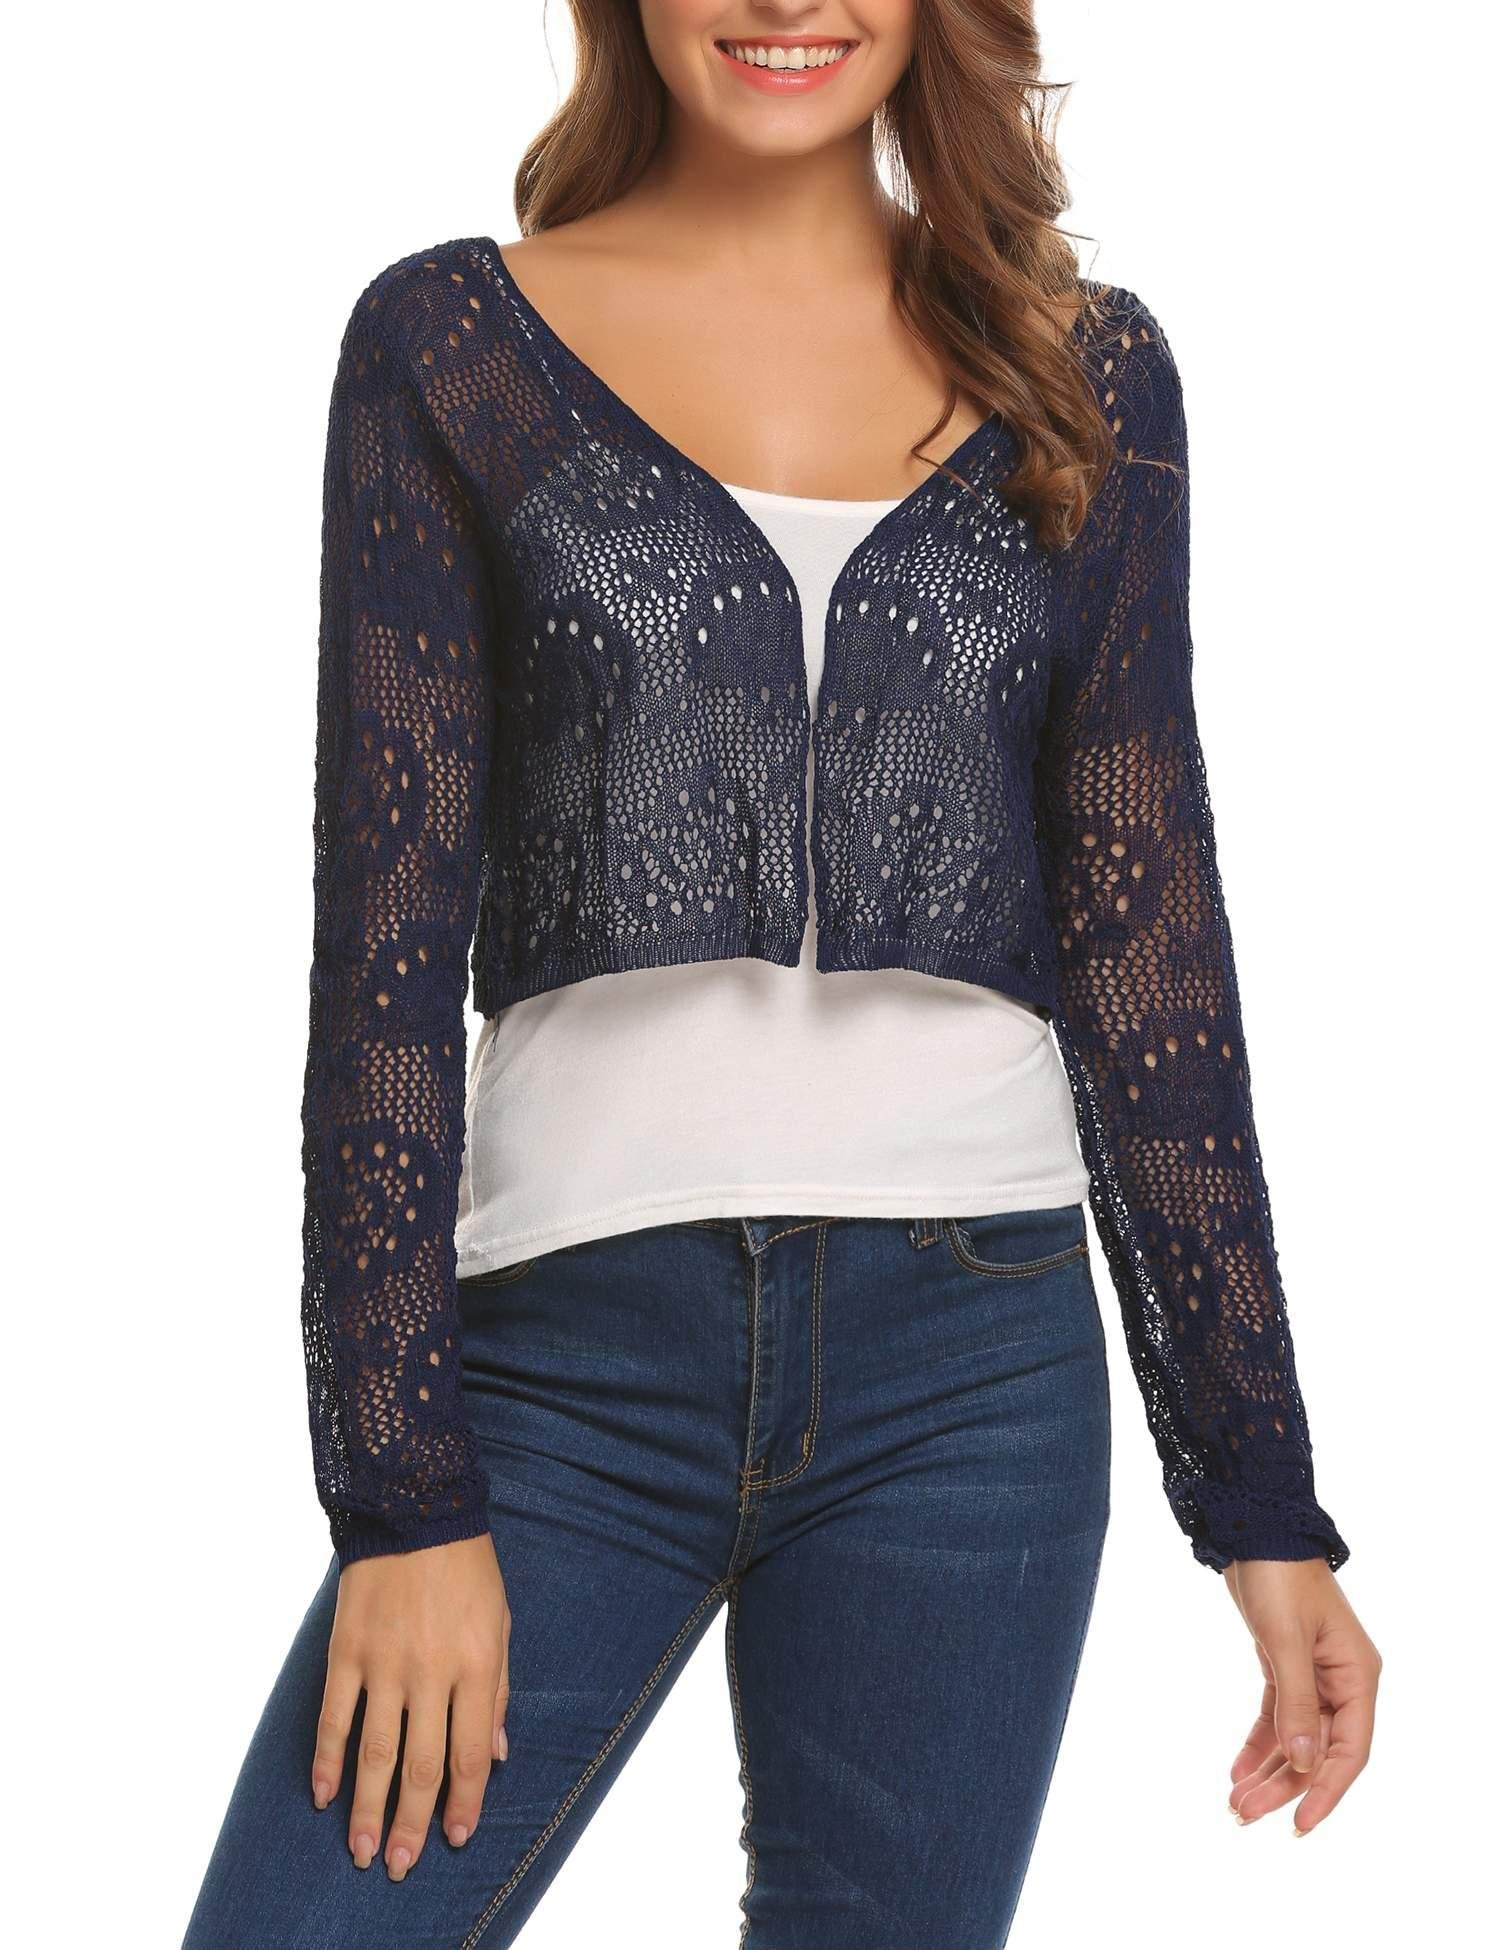 Zeagoo Womens Vintage Lace Crochet Knitted Bolero Shrug Retro Style Open Cardigan Crop Top Navy Blue/XXL